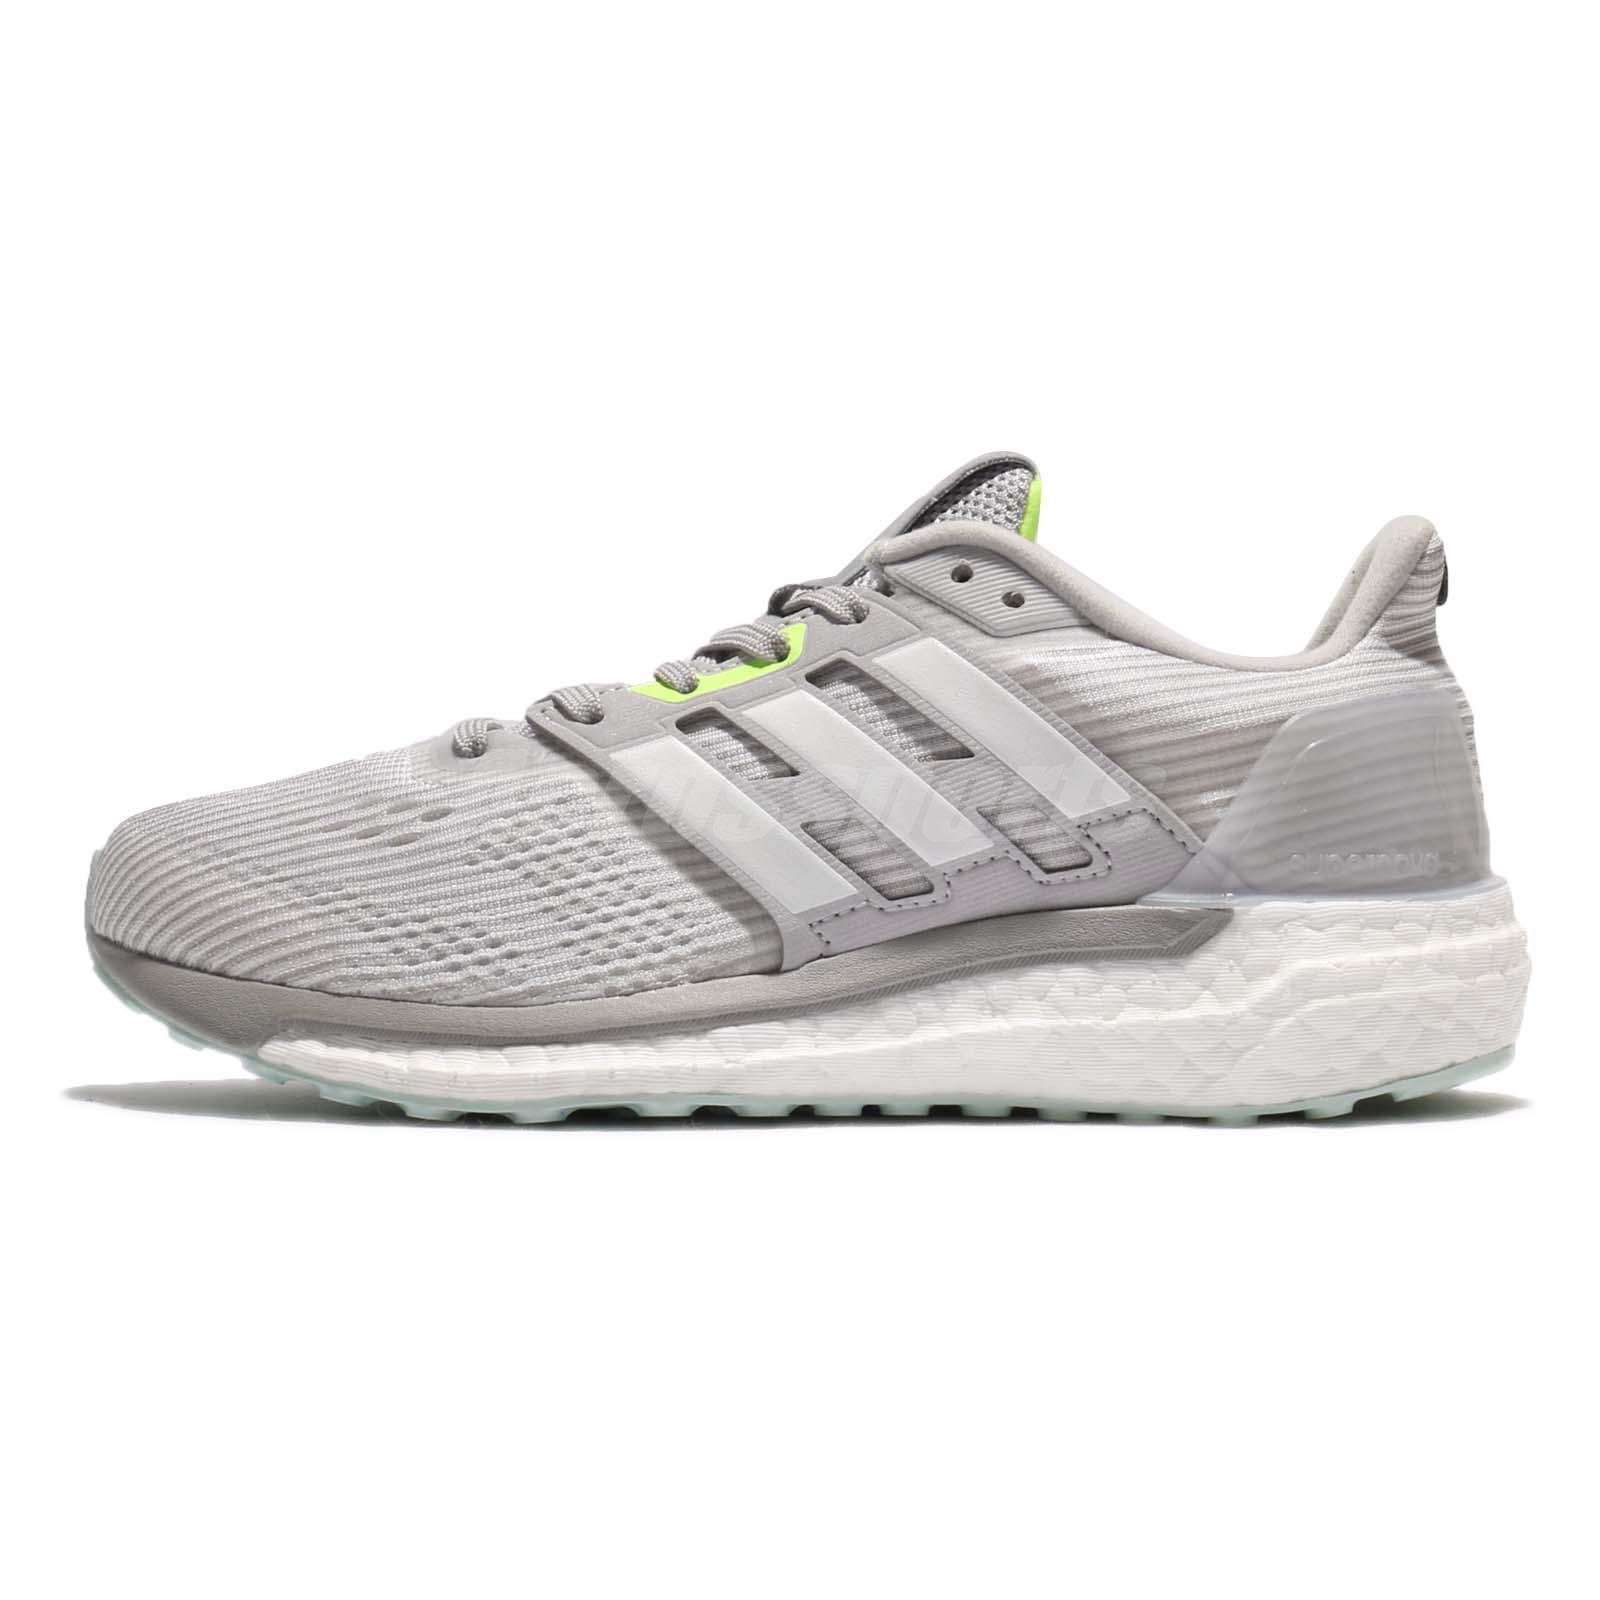 big sale 063dd bbdc9 Adidas Supernova Continental BOOST Grey Green Women Running Shoes BA9937 Sz  11